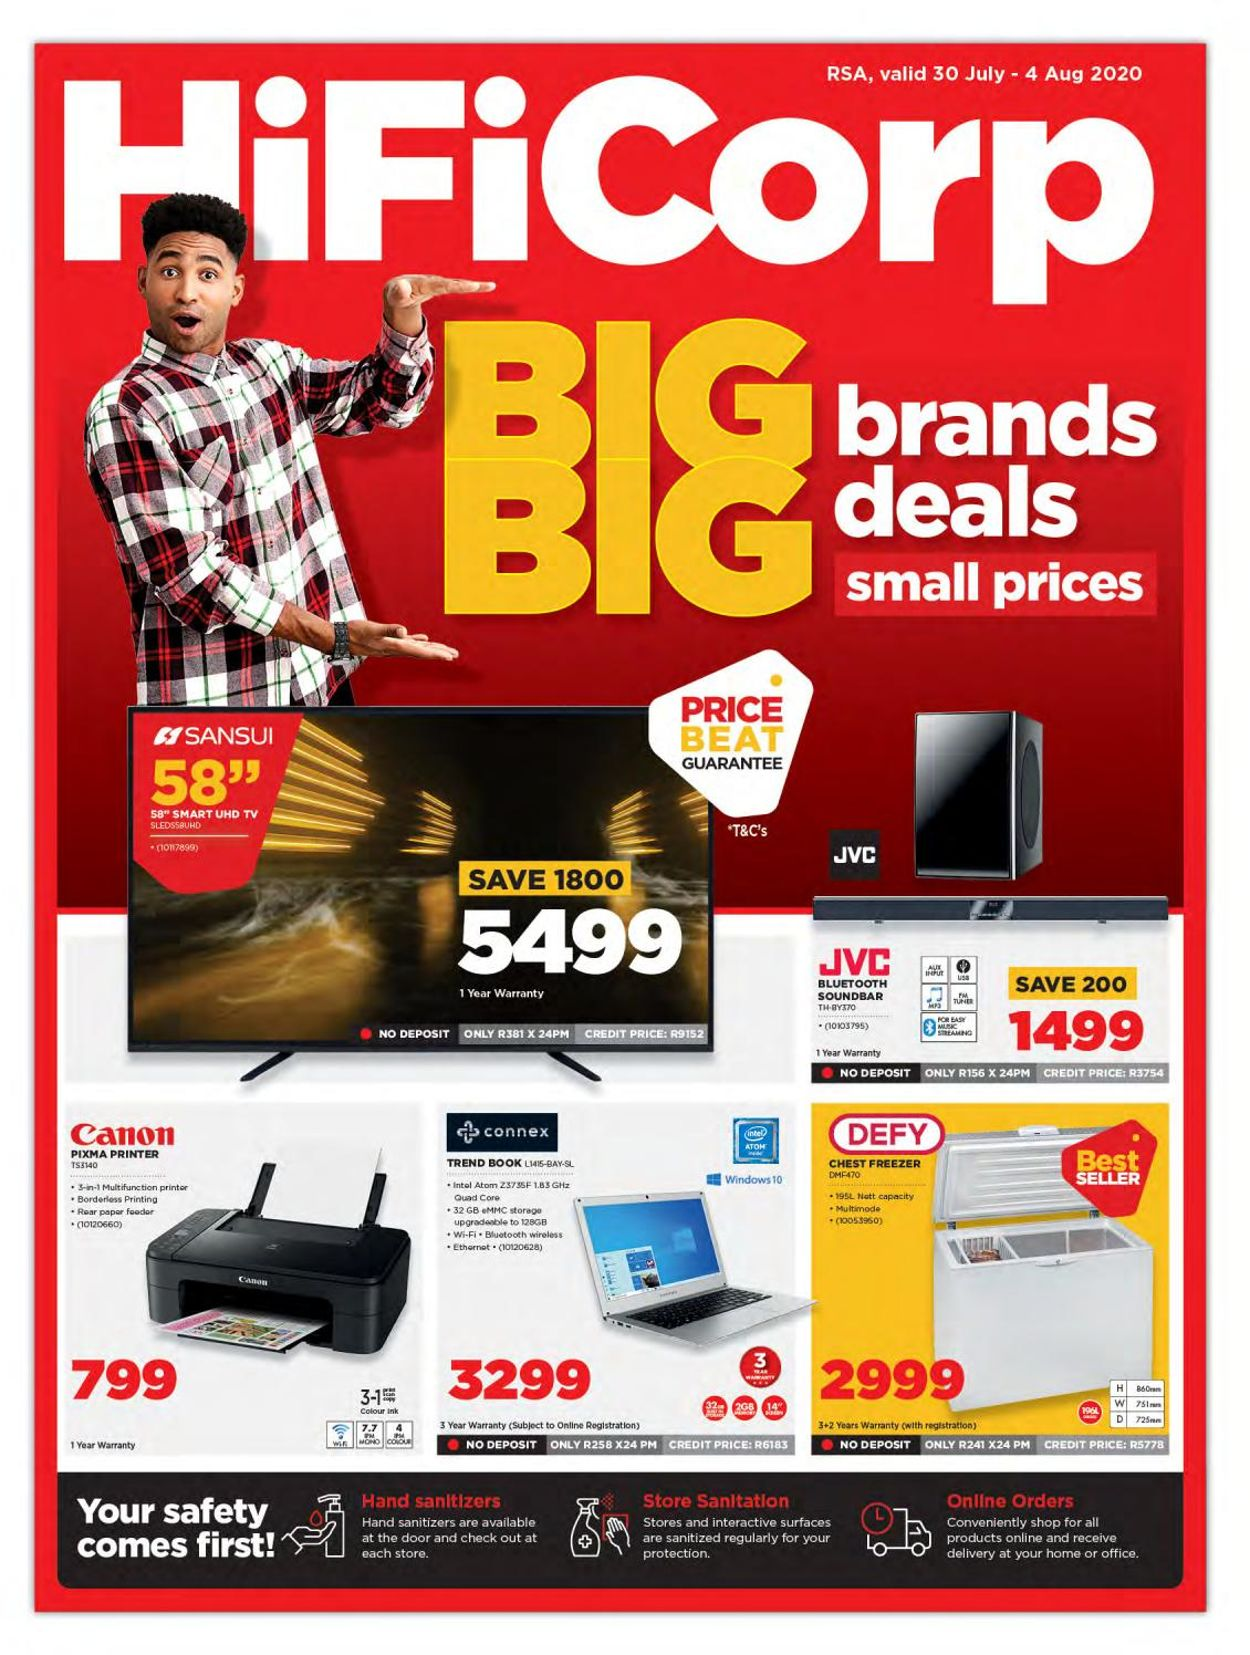 HiFi Corp Catalogue - 2020/07/30-2020/08/04